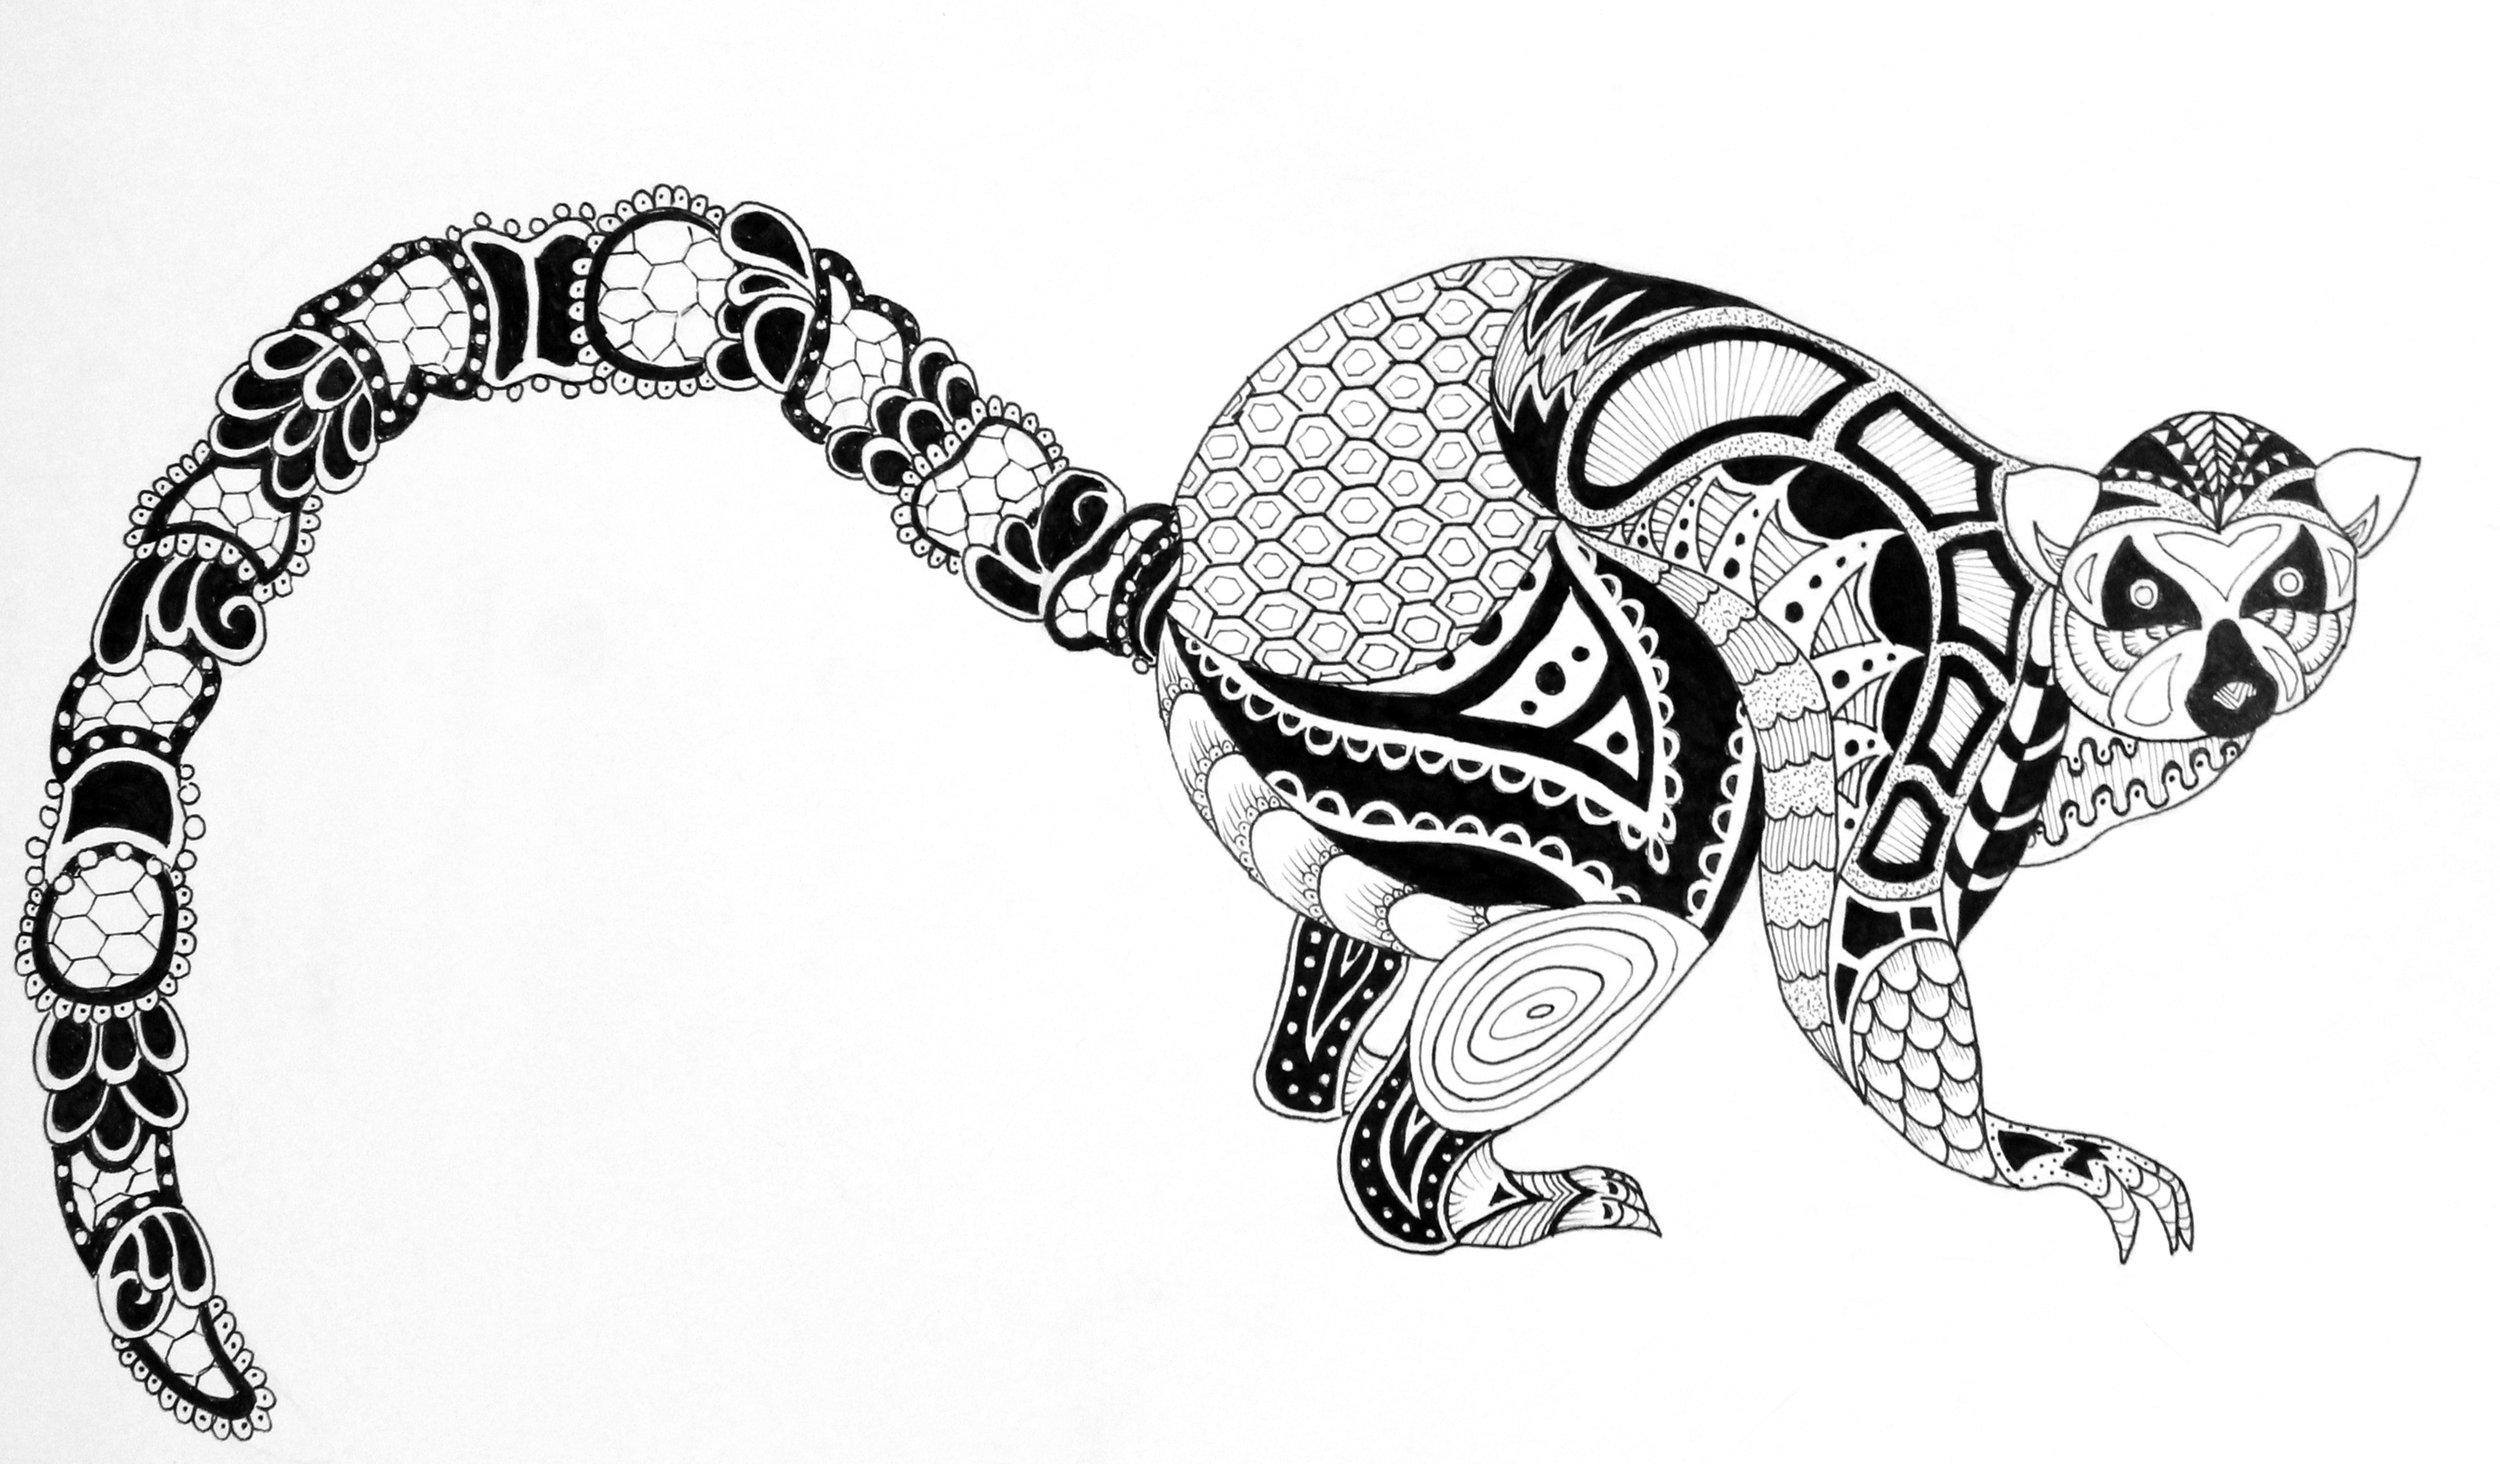 Zentangle Animal Series - Lemur (marker on 9x12 paper)